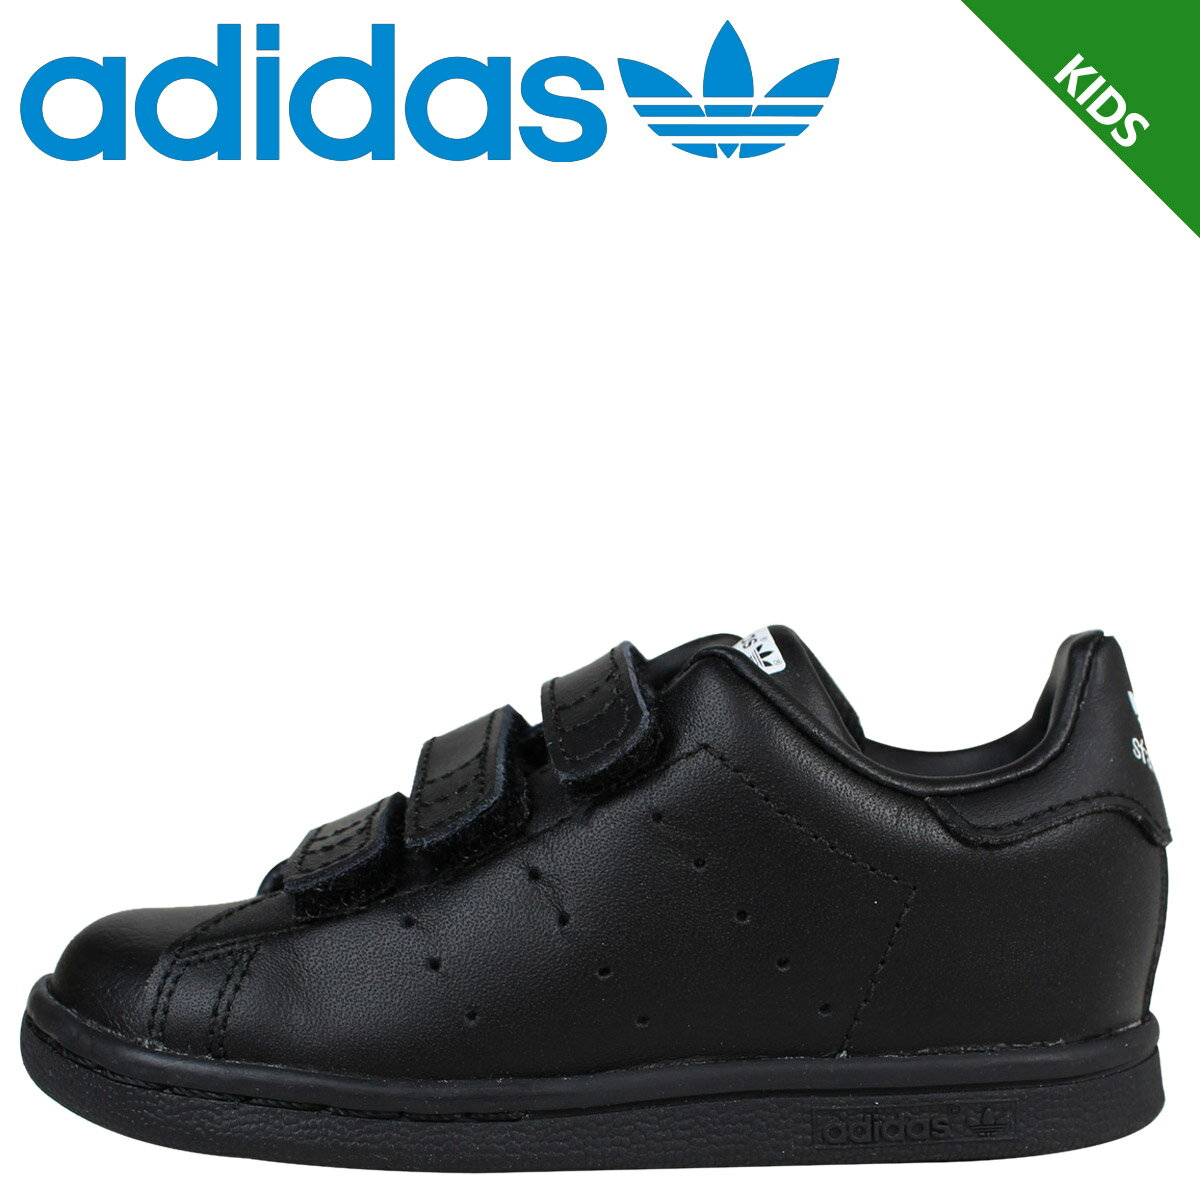 adidas アディダス スタンスミス スニーカー ベビー キッズ STAN SMITH CF I M20608 靴 ブラック